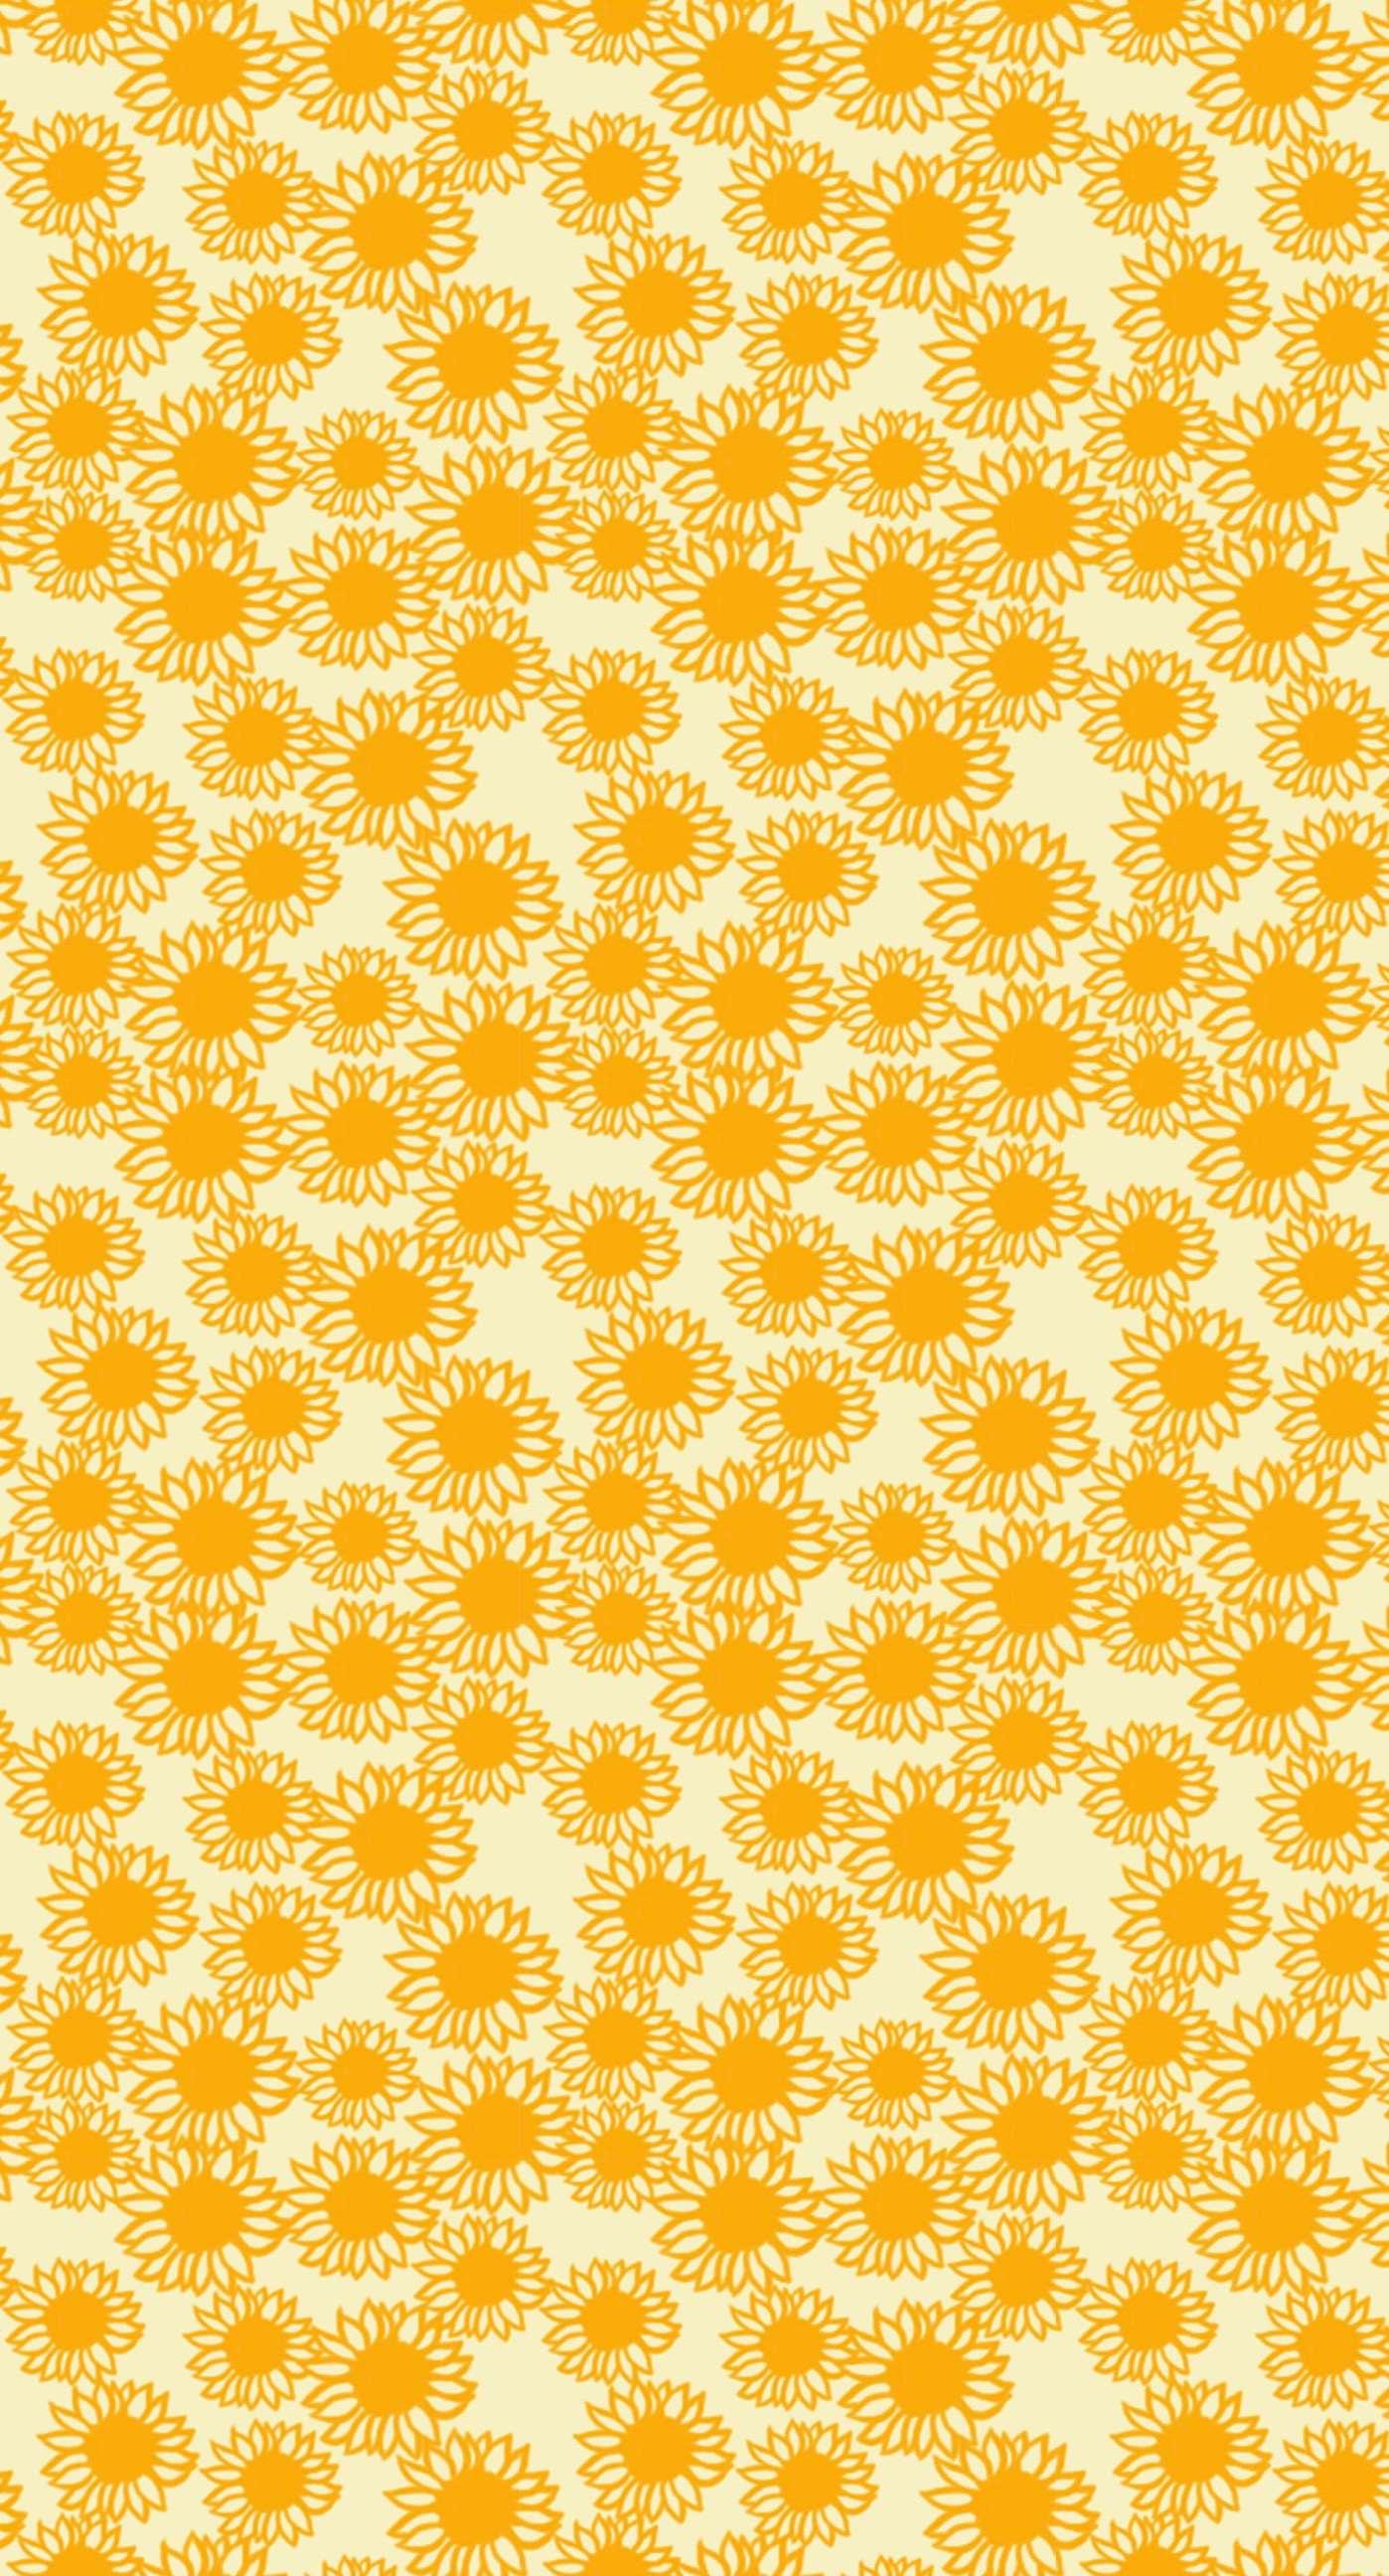 Pattern sunflower yellow women friendly wallpapersc iPhone7Plus 1398x2592